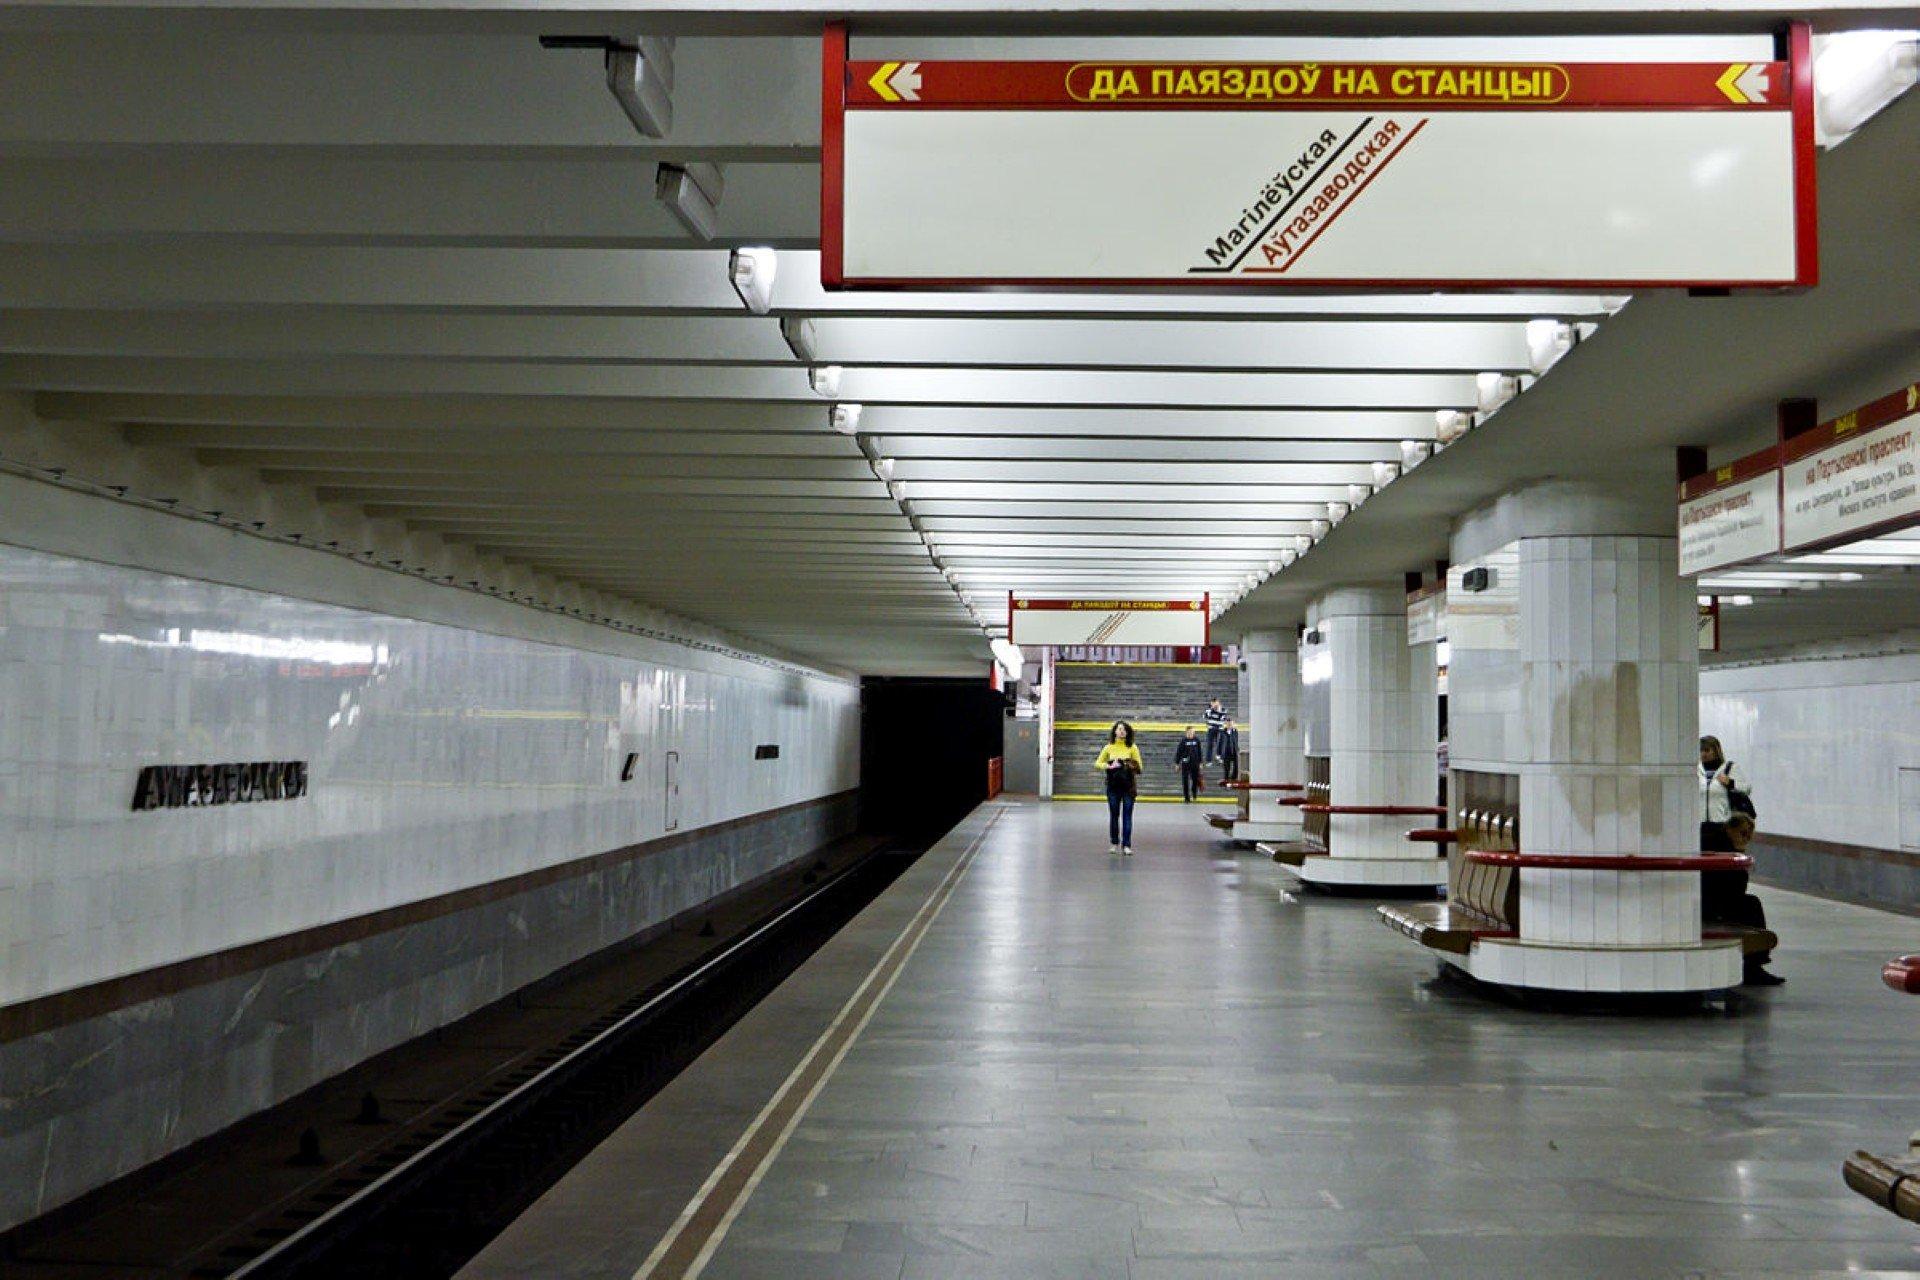 Из-за пенсионеров в Минске закрыли станцию метро